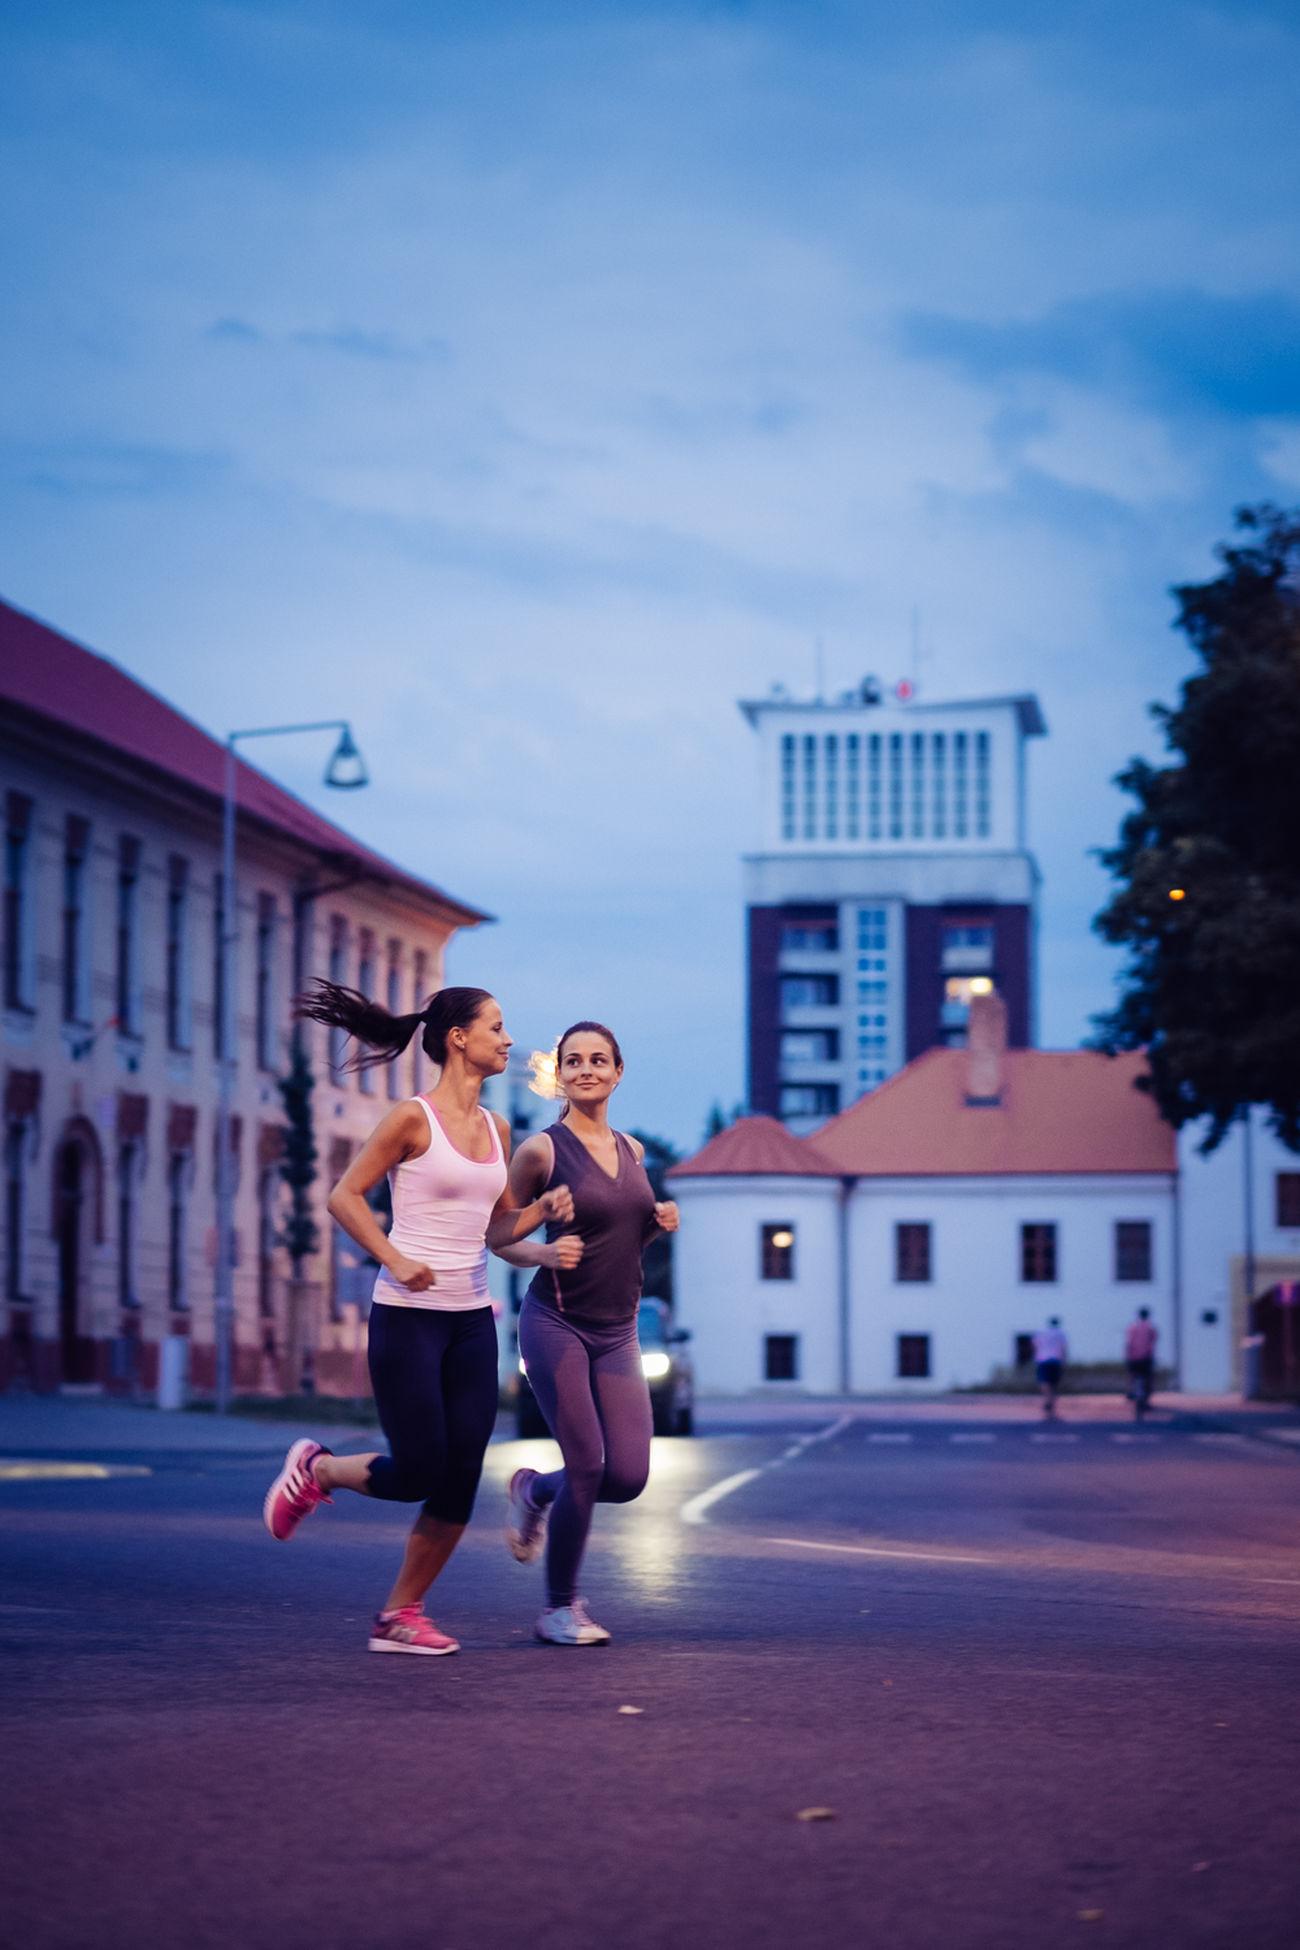 Night jogging Eye4photography  Streetphotography Shootermag EyeEm Best Edits